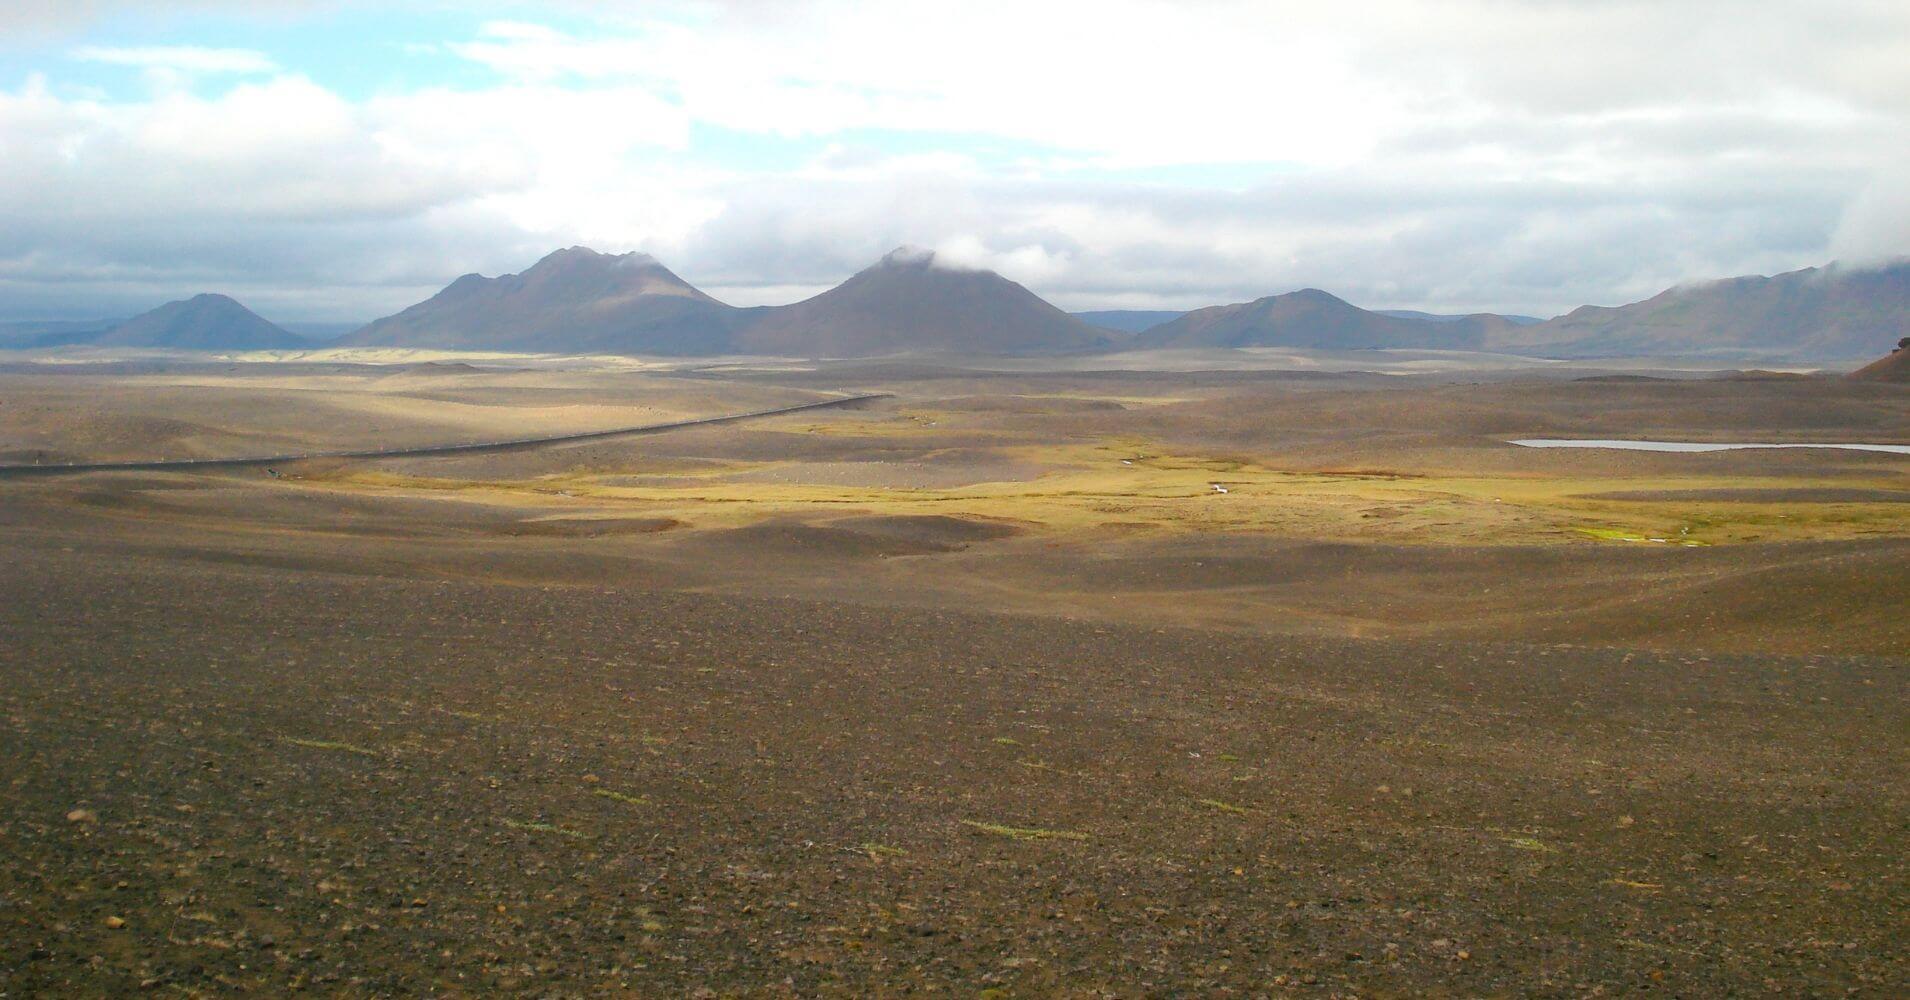 Paisaje de Llanuras y Volcanes Jökulsárgljúfur, Islandia.